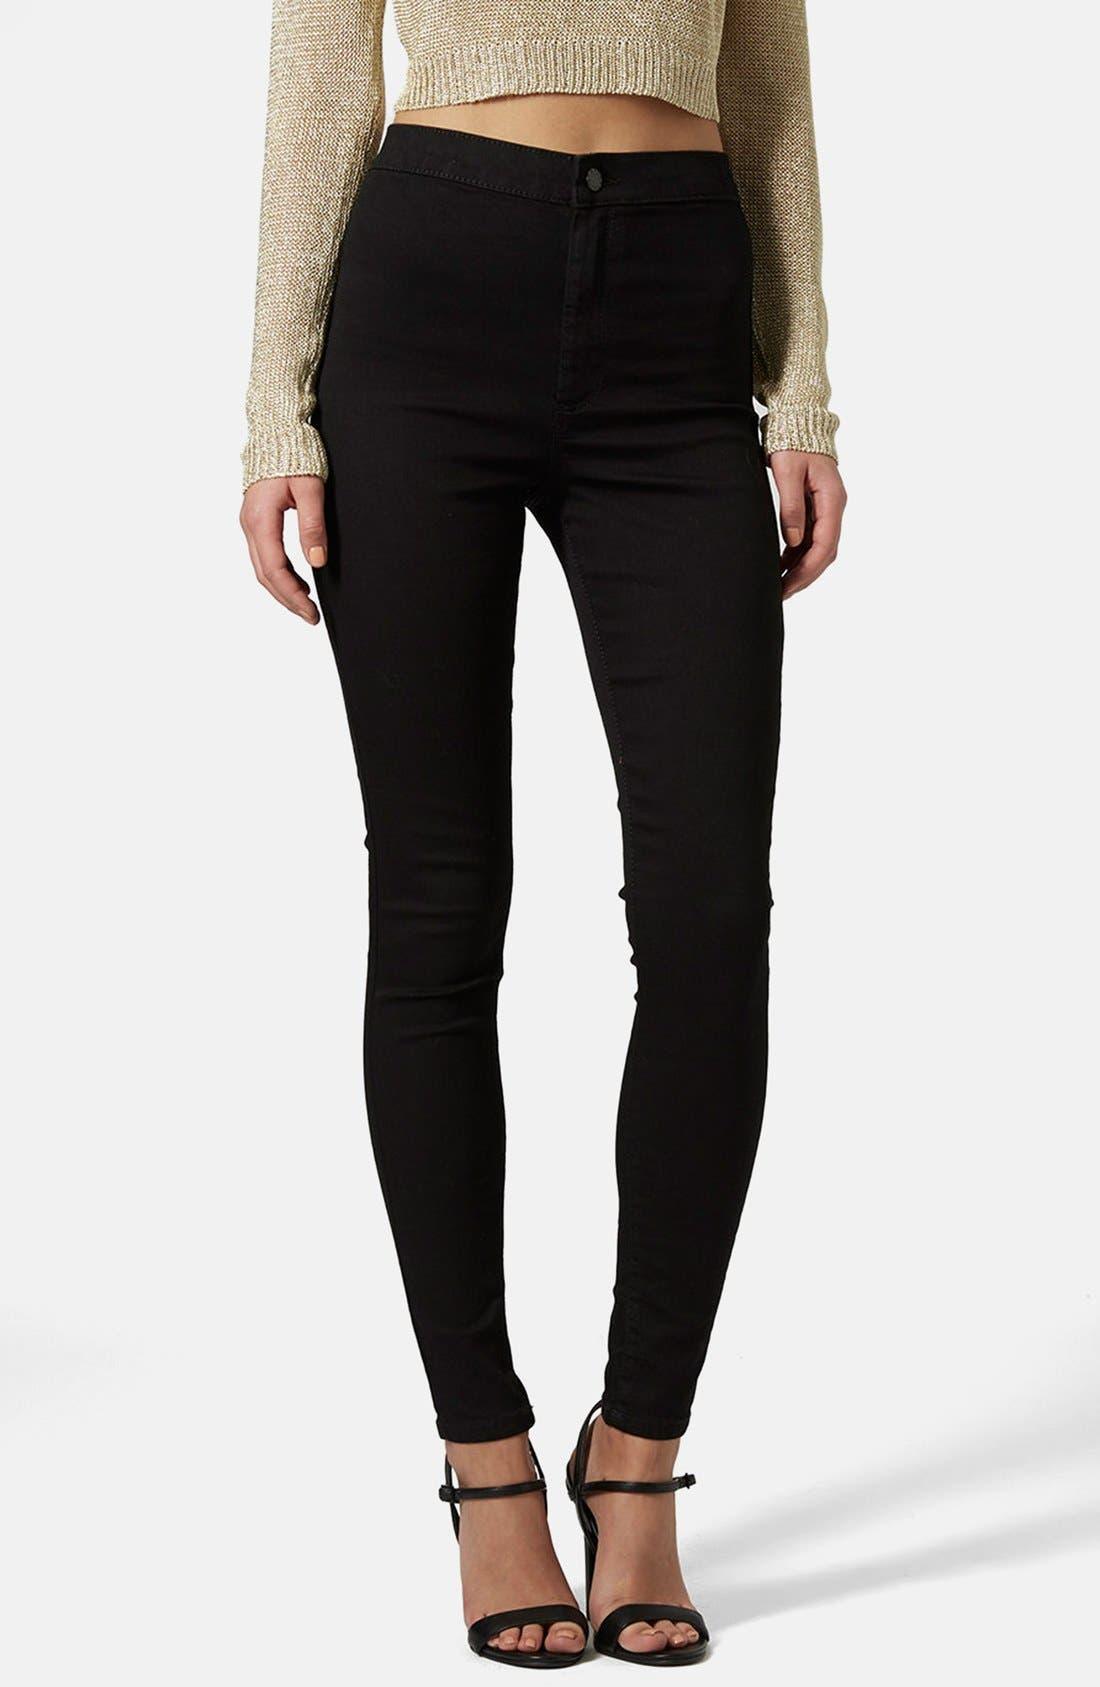 TOPSHOP, Joni High Waist Ankle Skinny Jeans, Main thumbnail 1, color, 001